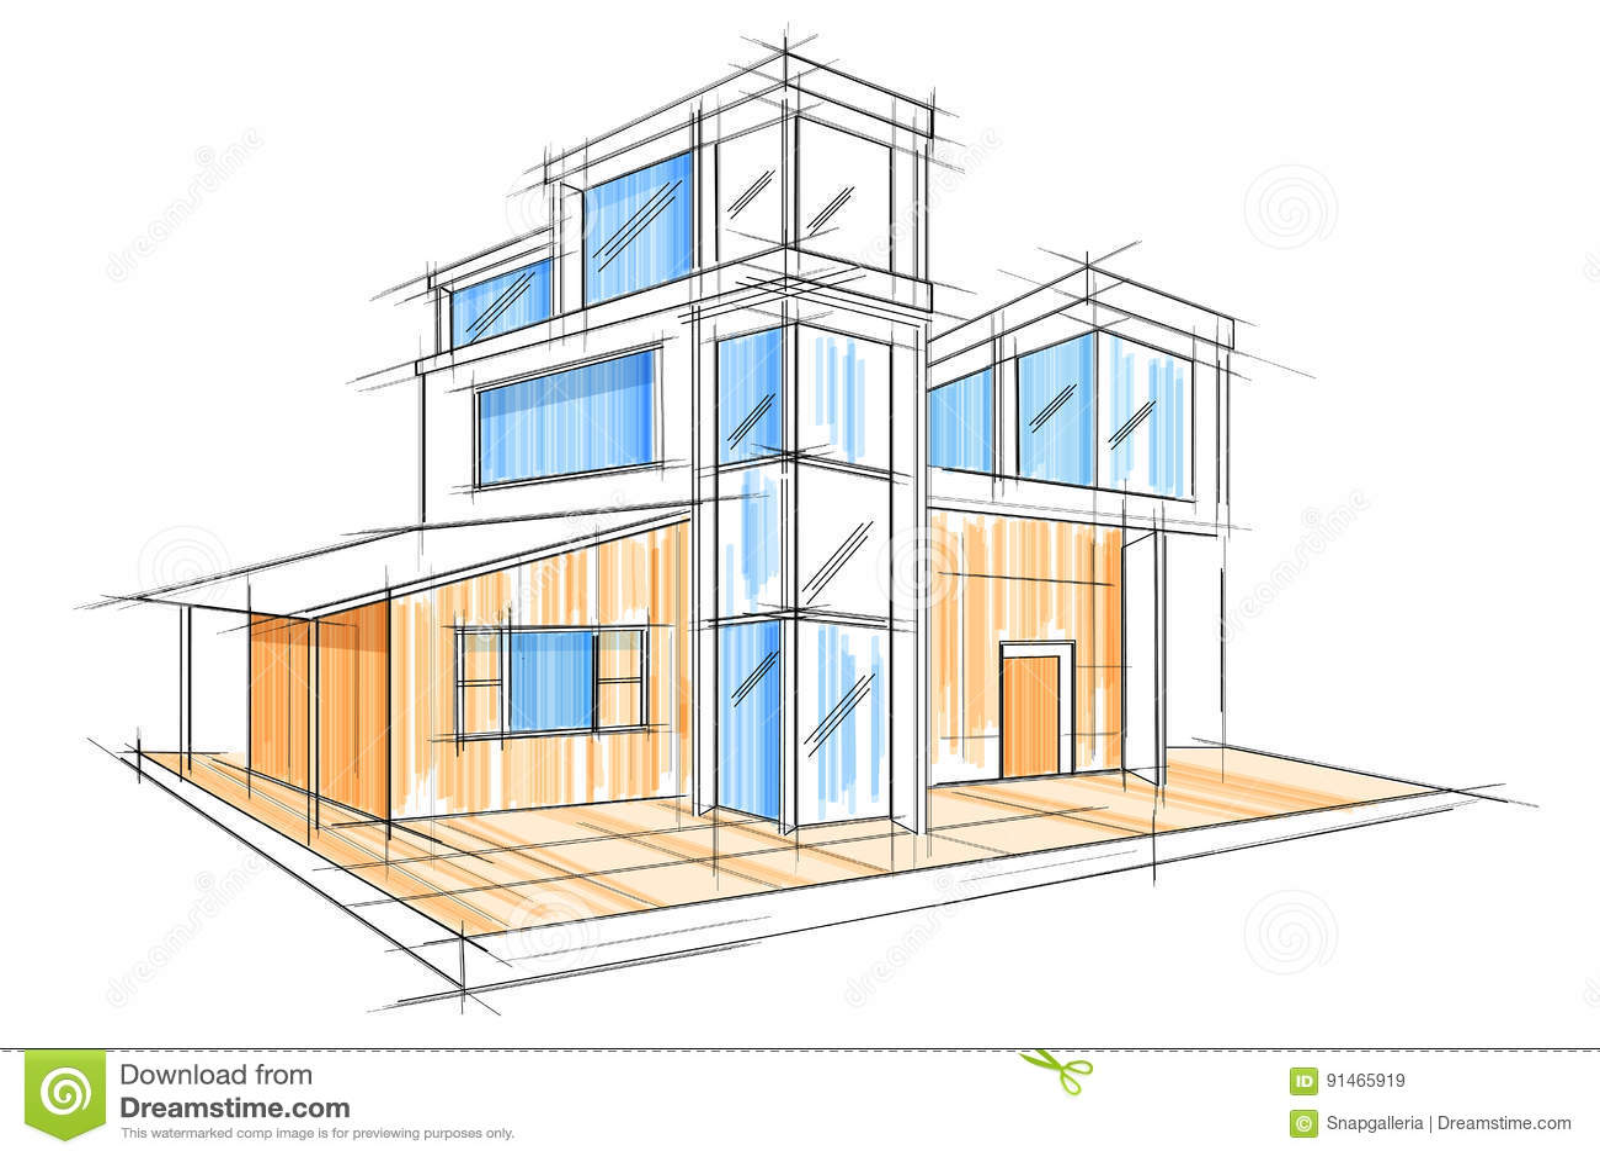 sketch exterior building draft blueprint design easy to edit vector illustration 91465919